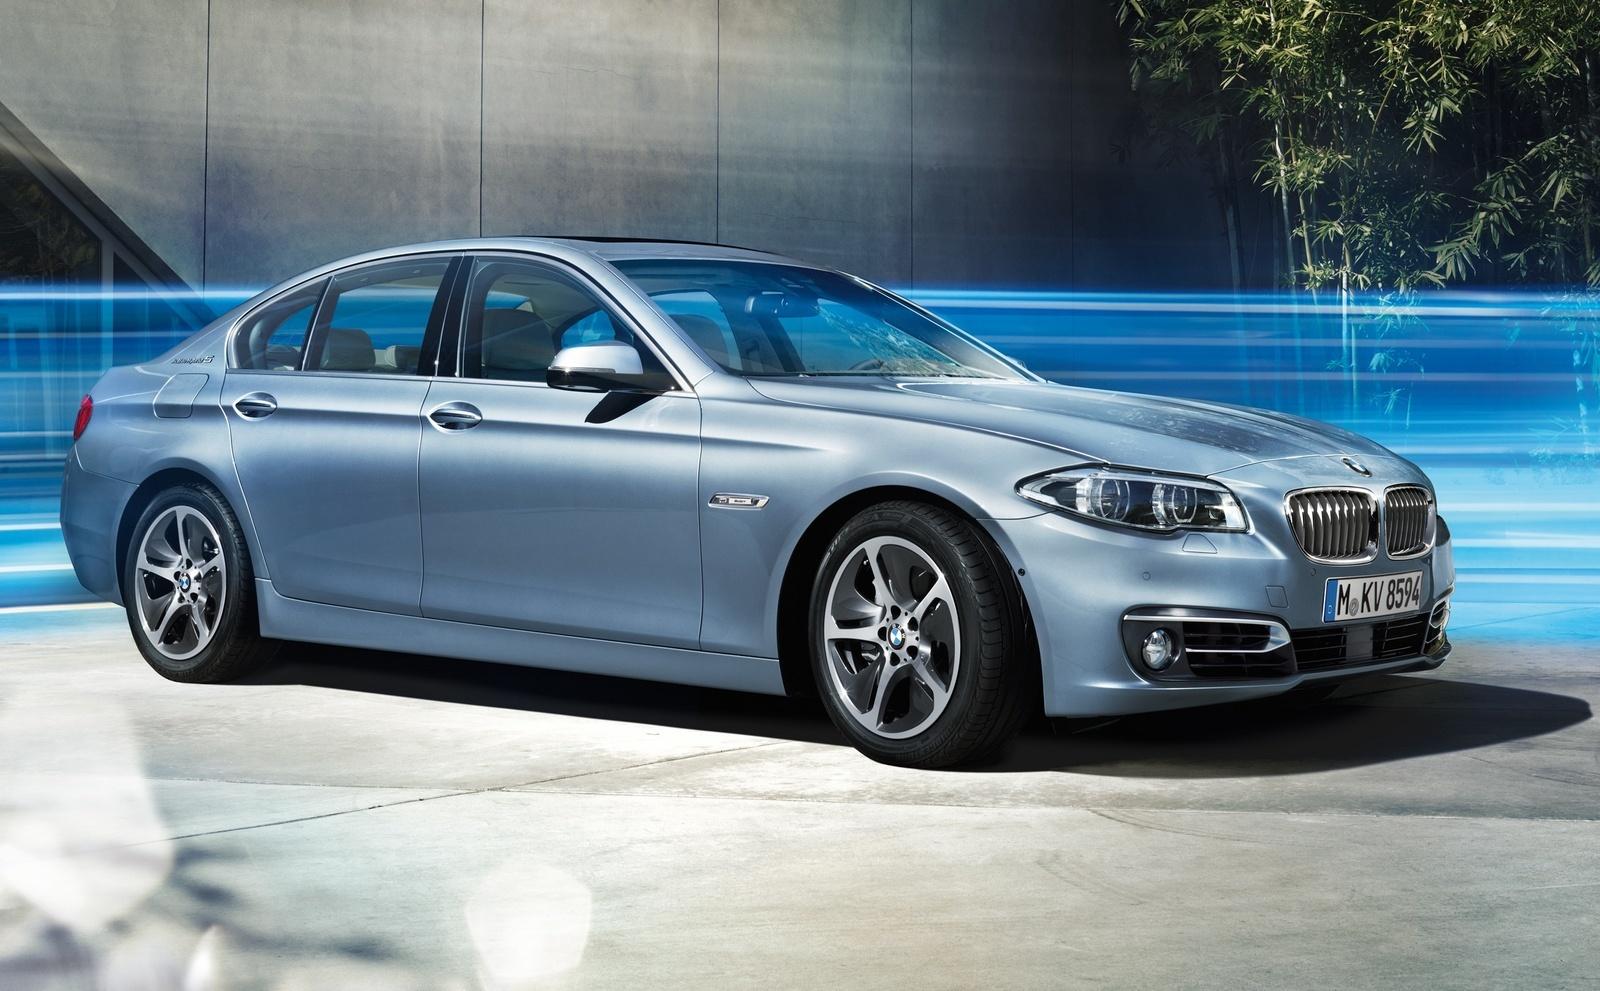 2014 BMW ActiveHybrid 5 - Overview - CarGurus